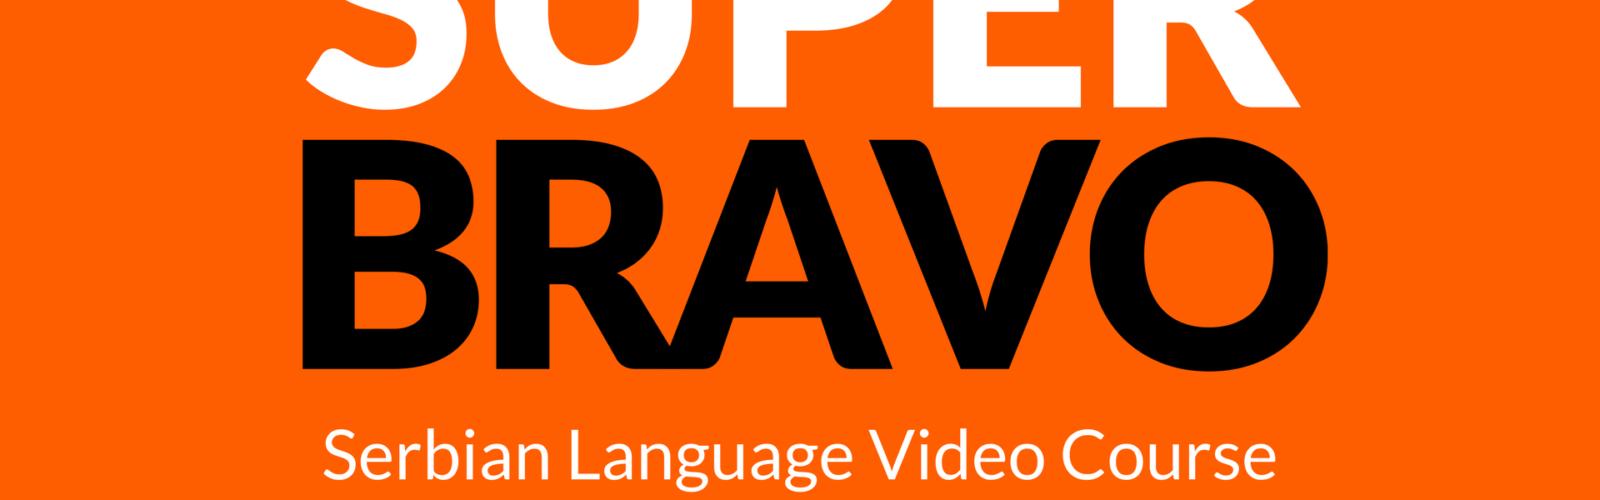 free serbian language video course